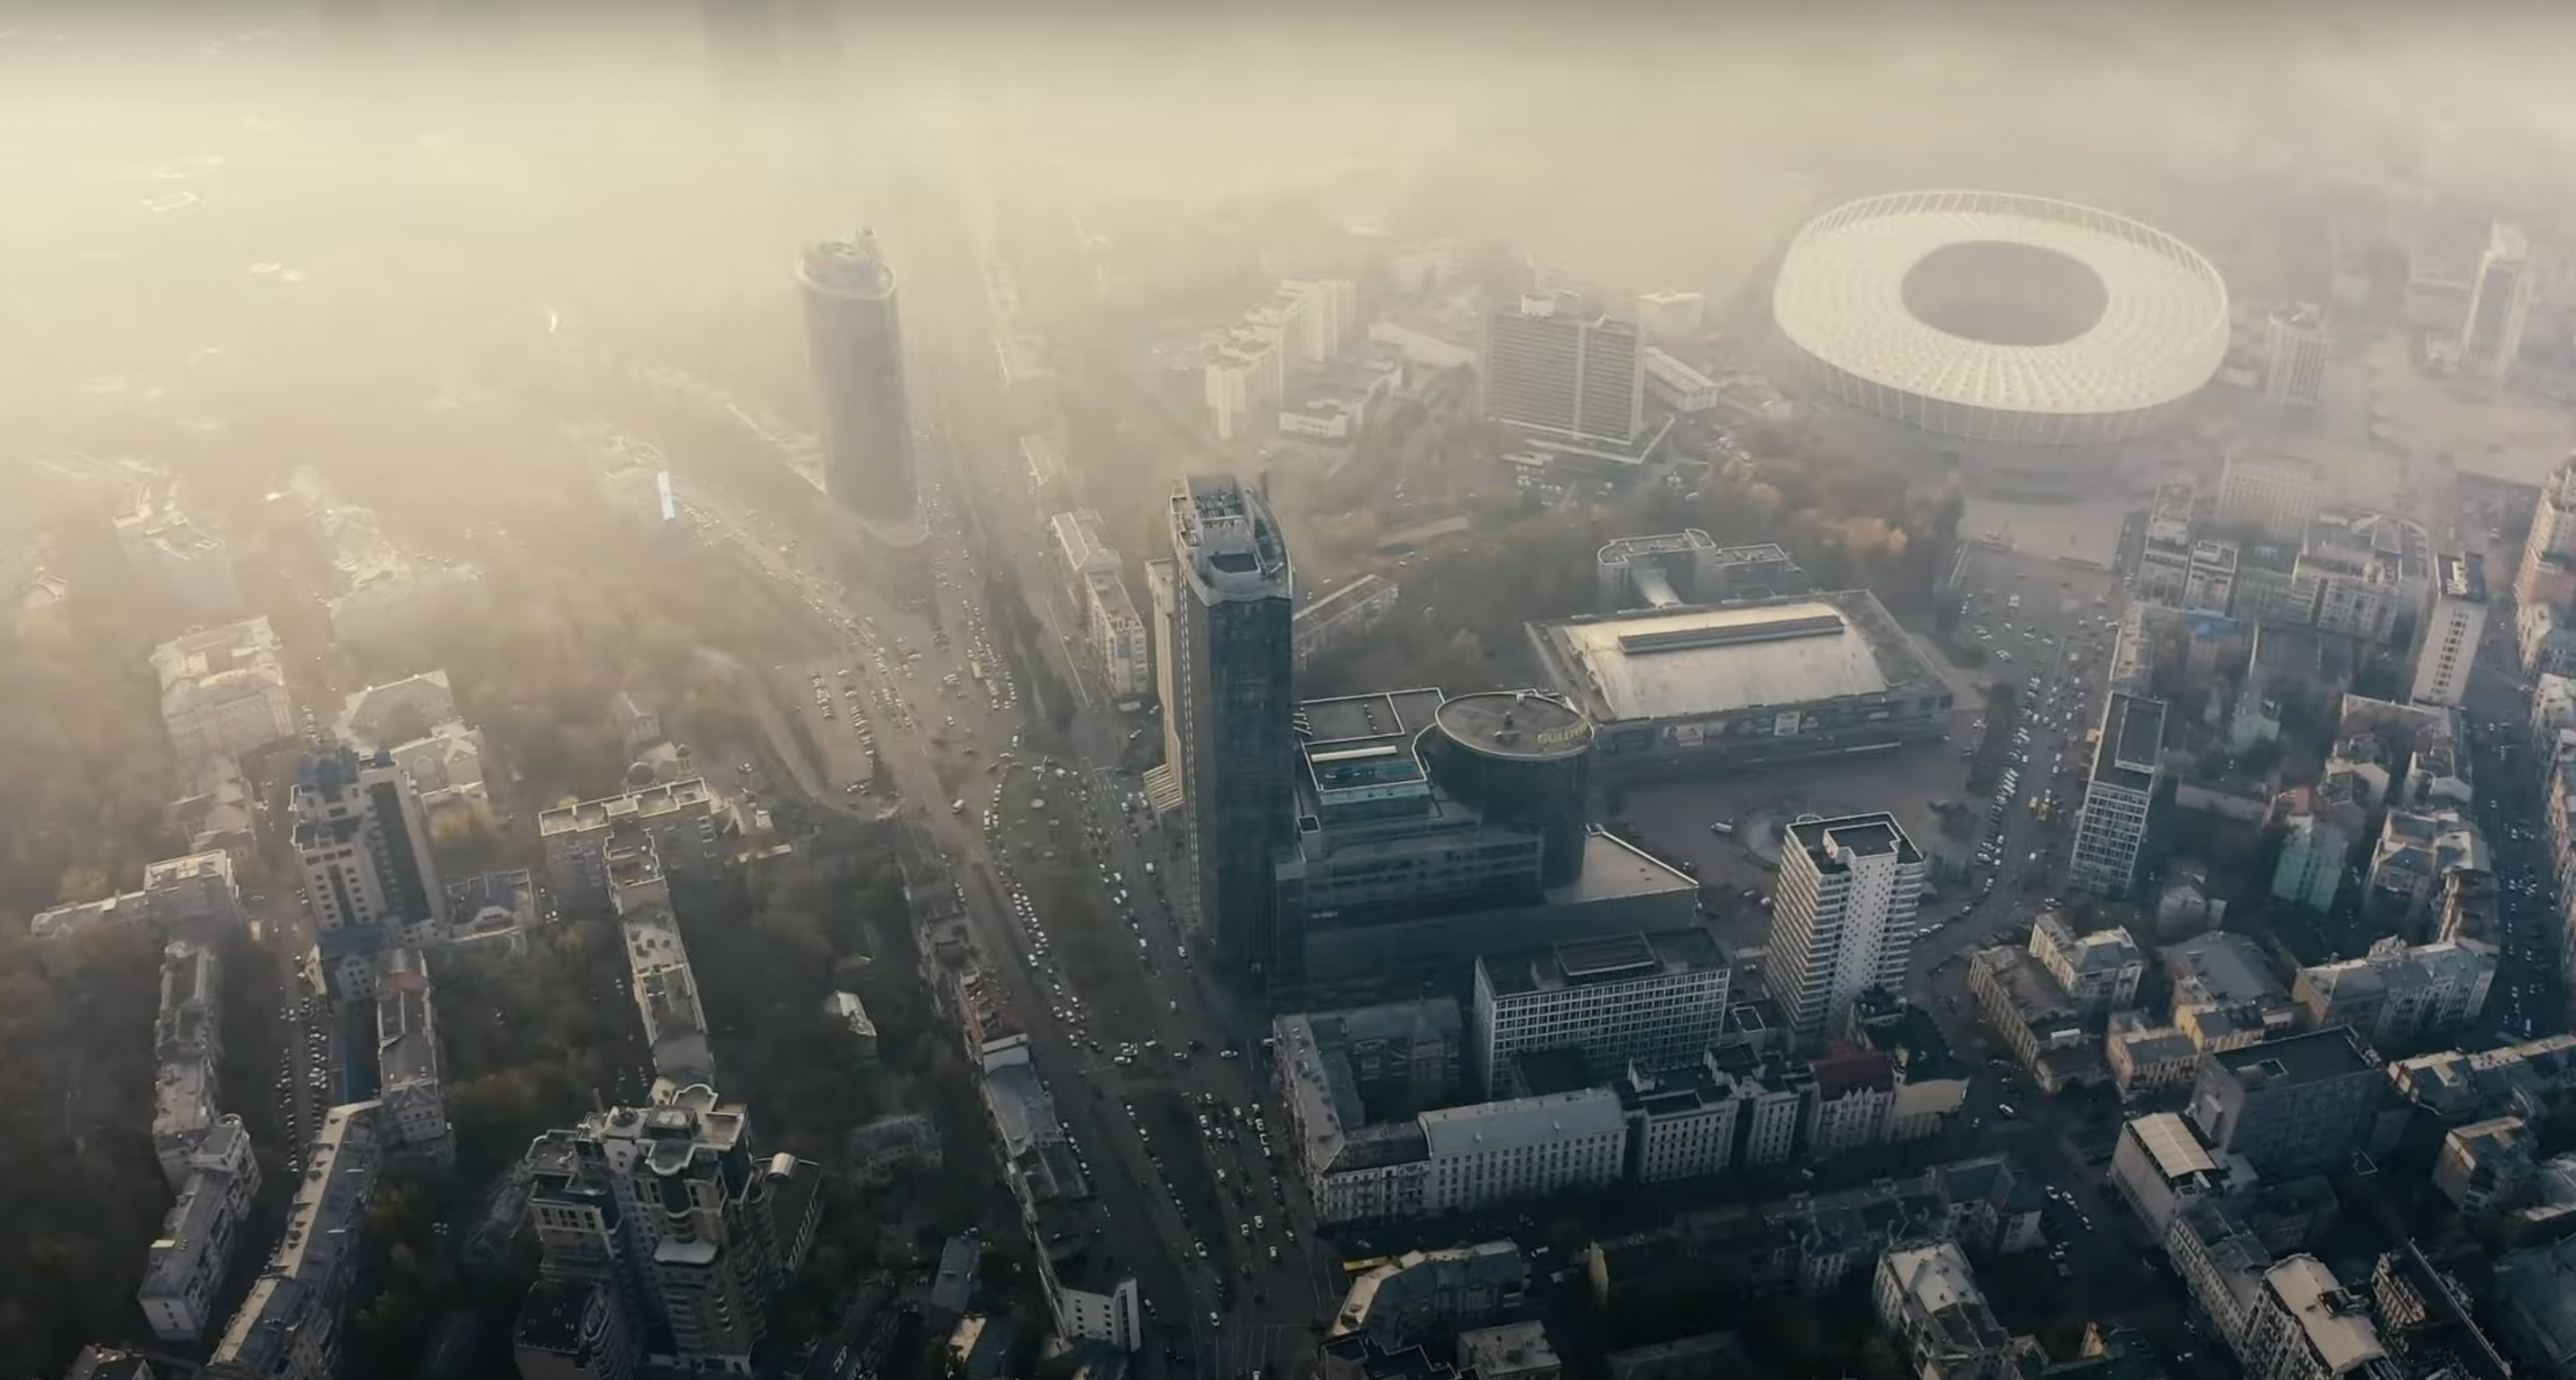 Clean cities aerial shot